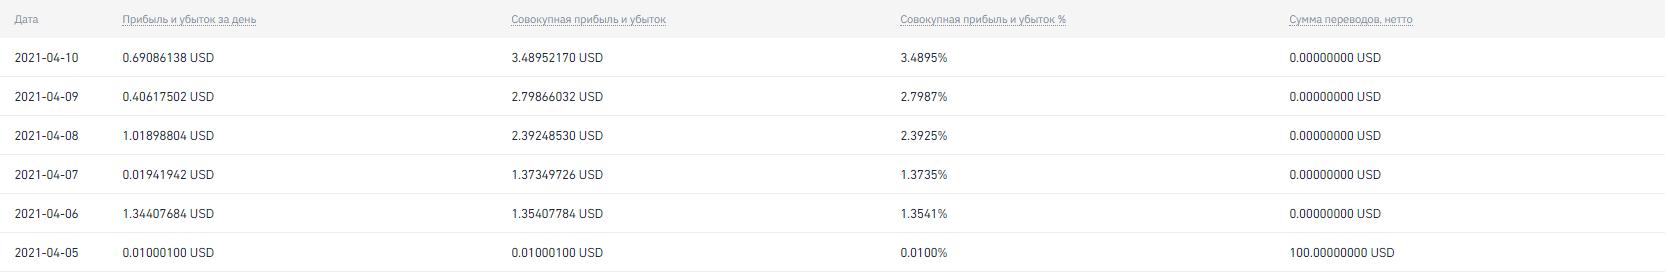 Таблица прибыли BiaAsk стратегии за апрель 2021